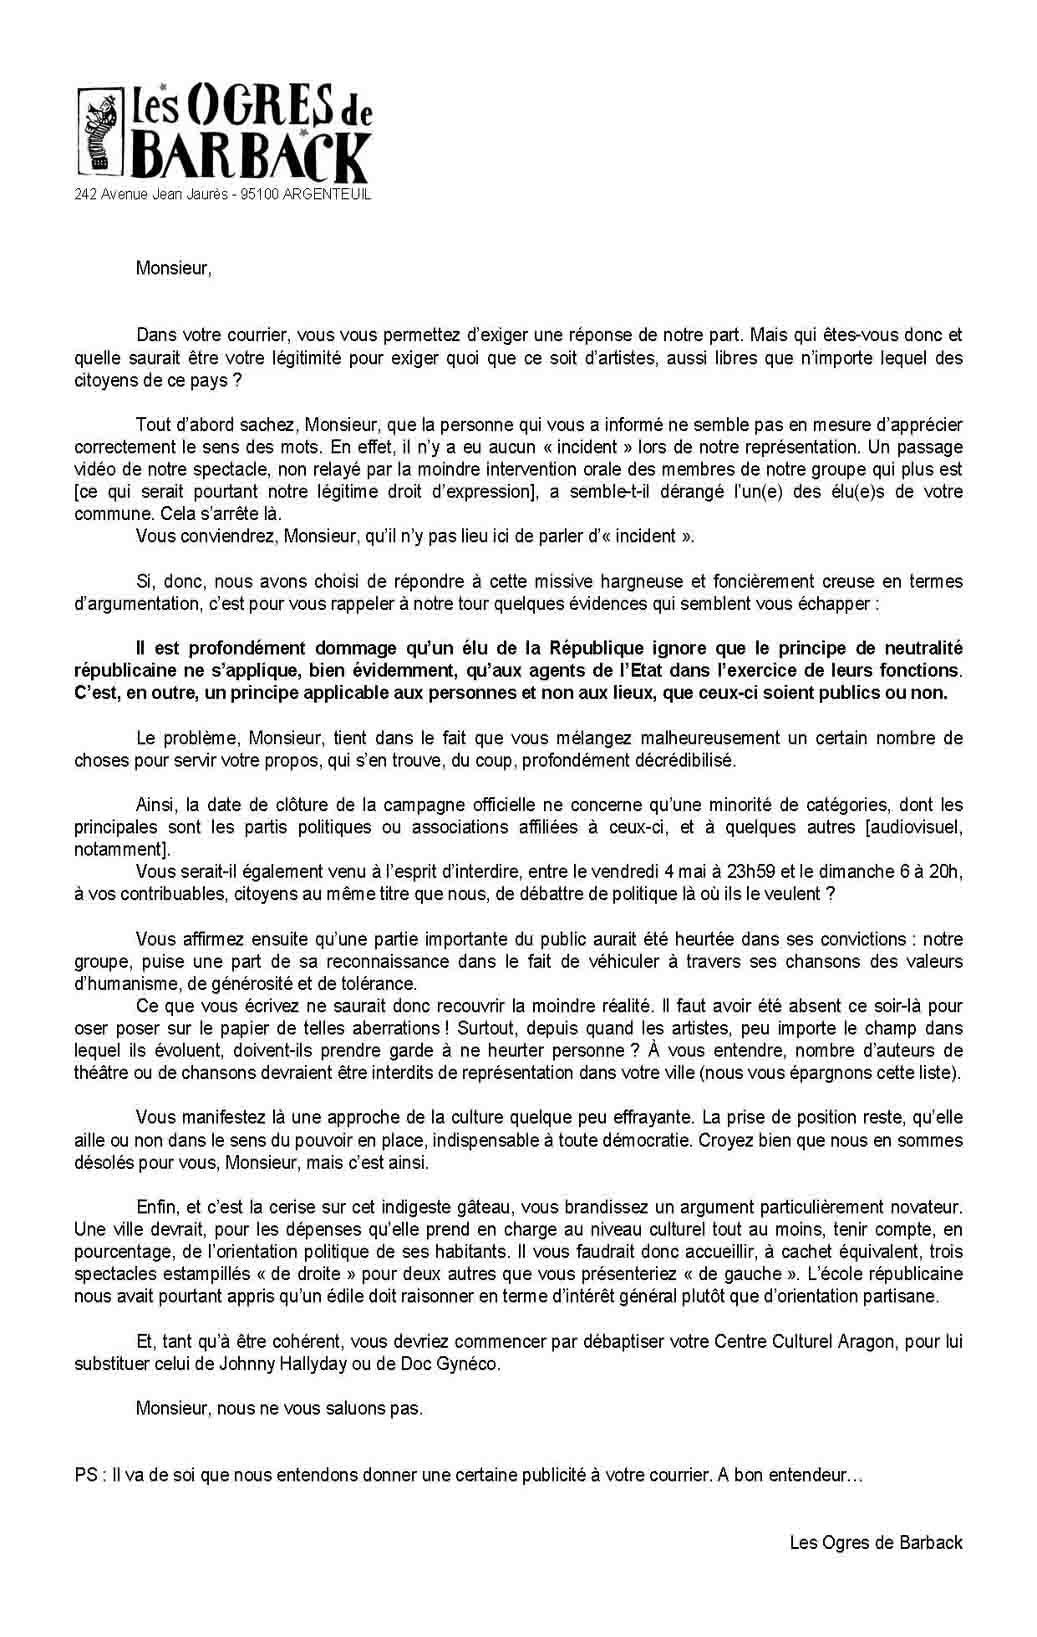 Les Ogres De Barback La Pittoresque Histoire De Pitt'ocha : ogres, barback, pittoresque, histoire, pitt'ocha, Caroline, Turquet:, Pittoresque, Histoire